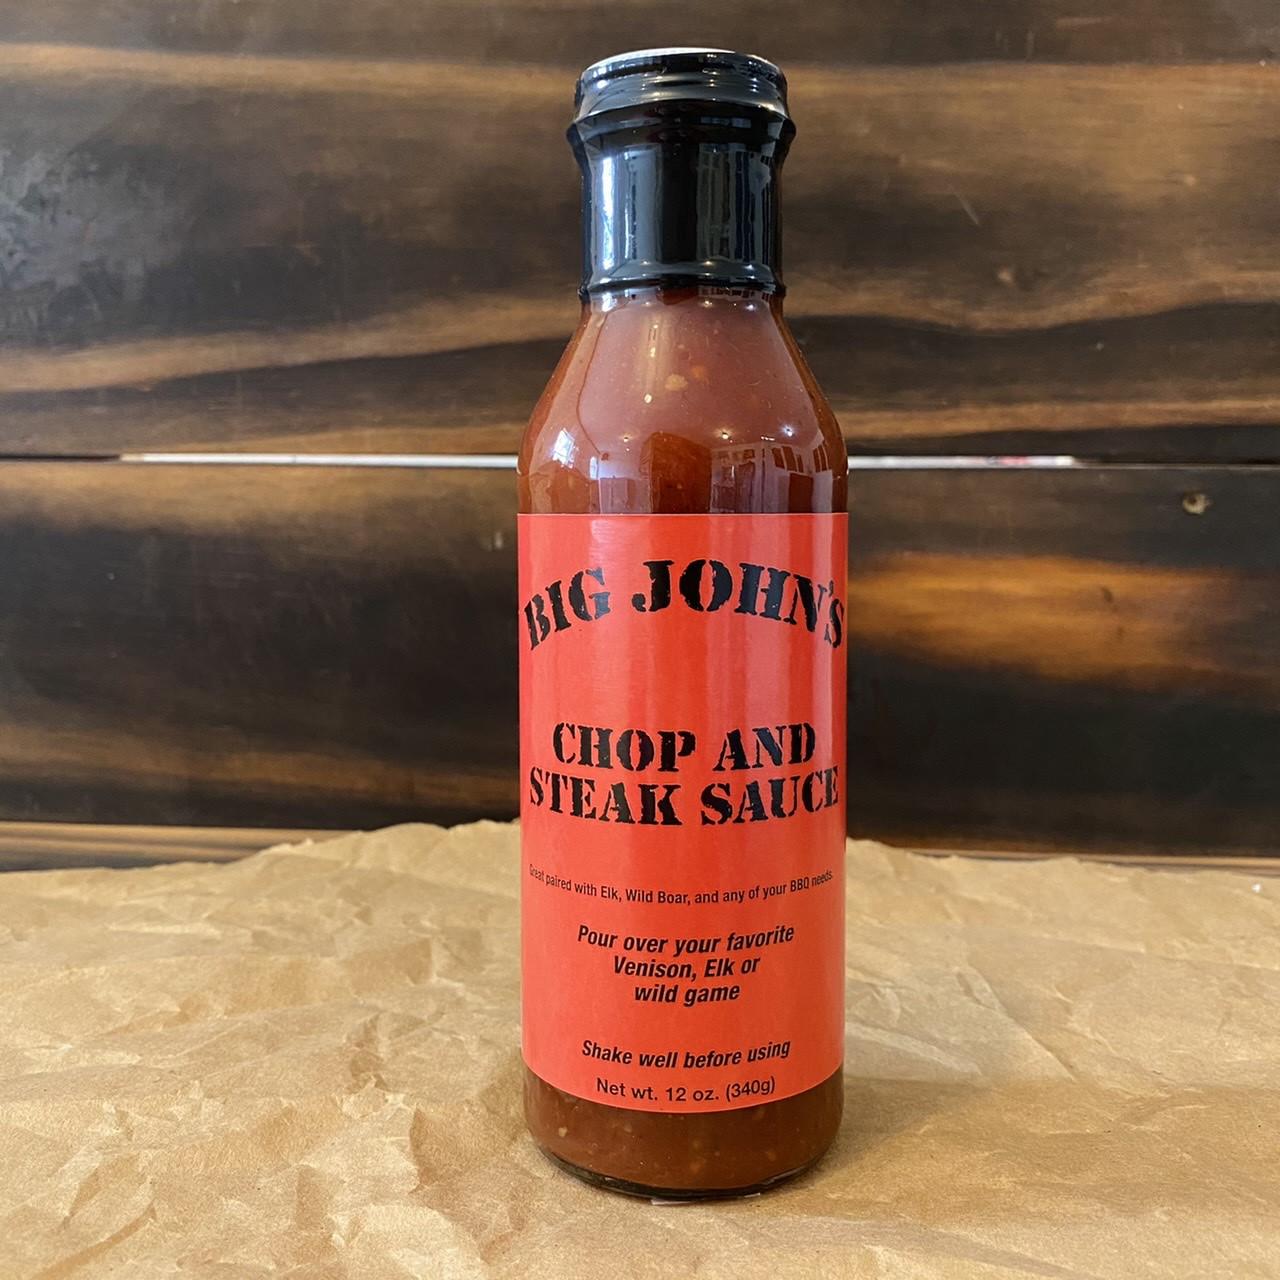 Big John's Chop & Steak Sauce